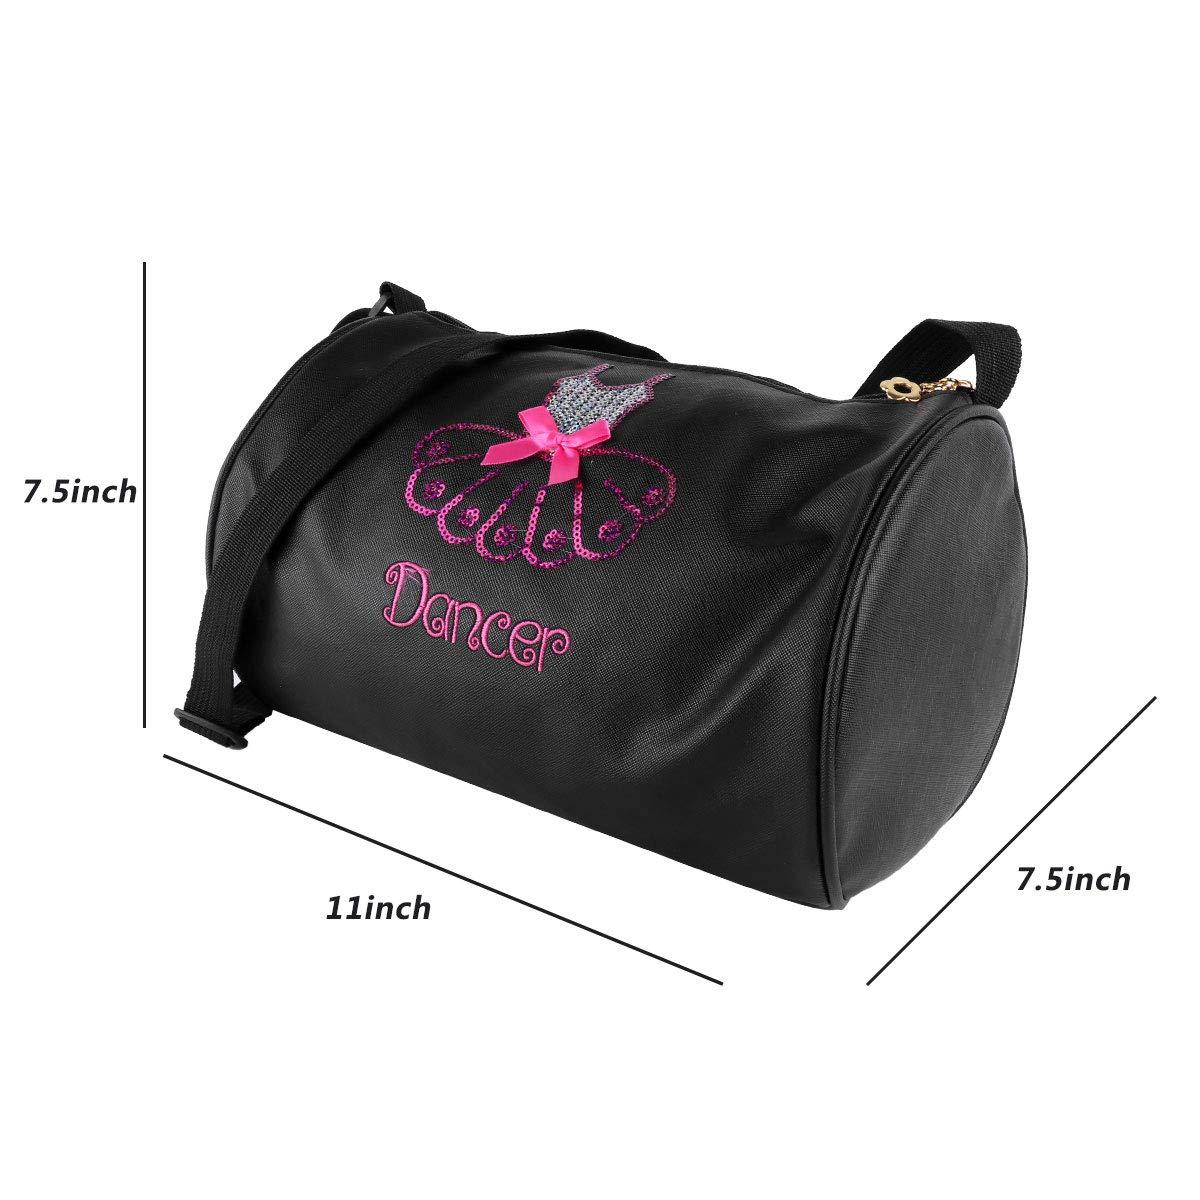 73039adb600 Amazon.com  CHICTRY Kids Girls Ballet Dance Bag Adorable Sequin Embroidered  Dress Duffle Bag Dancing Shoulder Bag School Bag Gym Hand Bag Children  Birthday ...